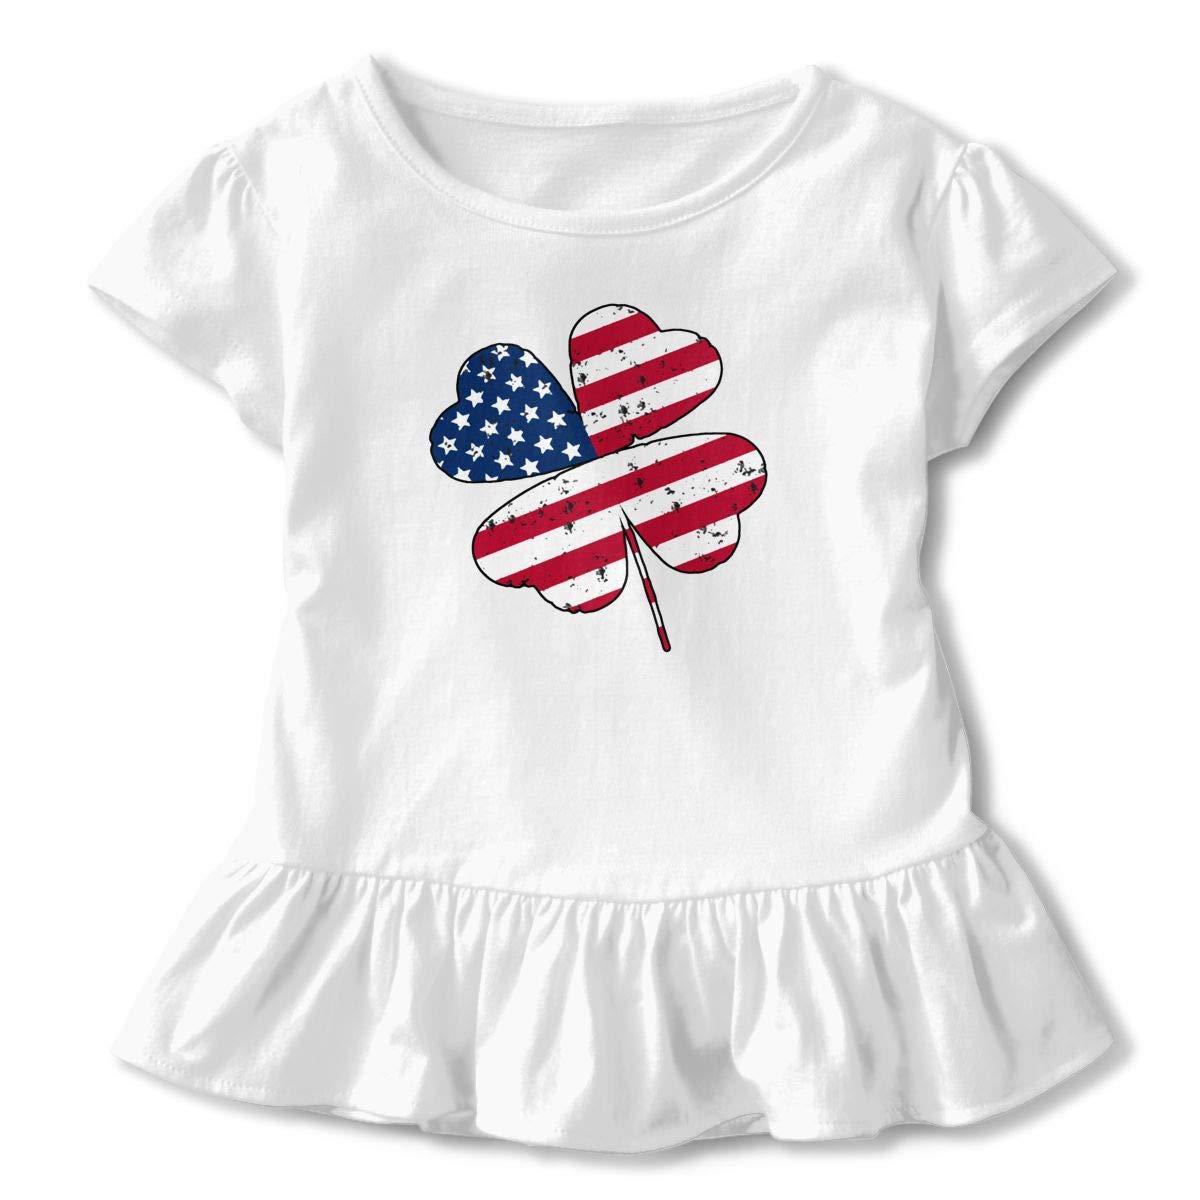 Shamrock Shaped Distressed American Flag Toddler Baby Girls Cotton Ruffle Short Sleeve Top Basic T-Shirt 2-6T